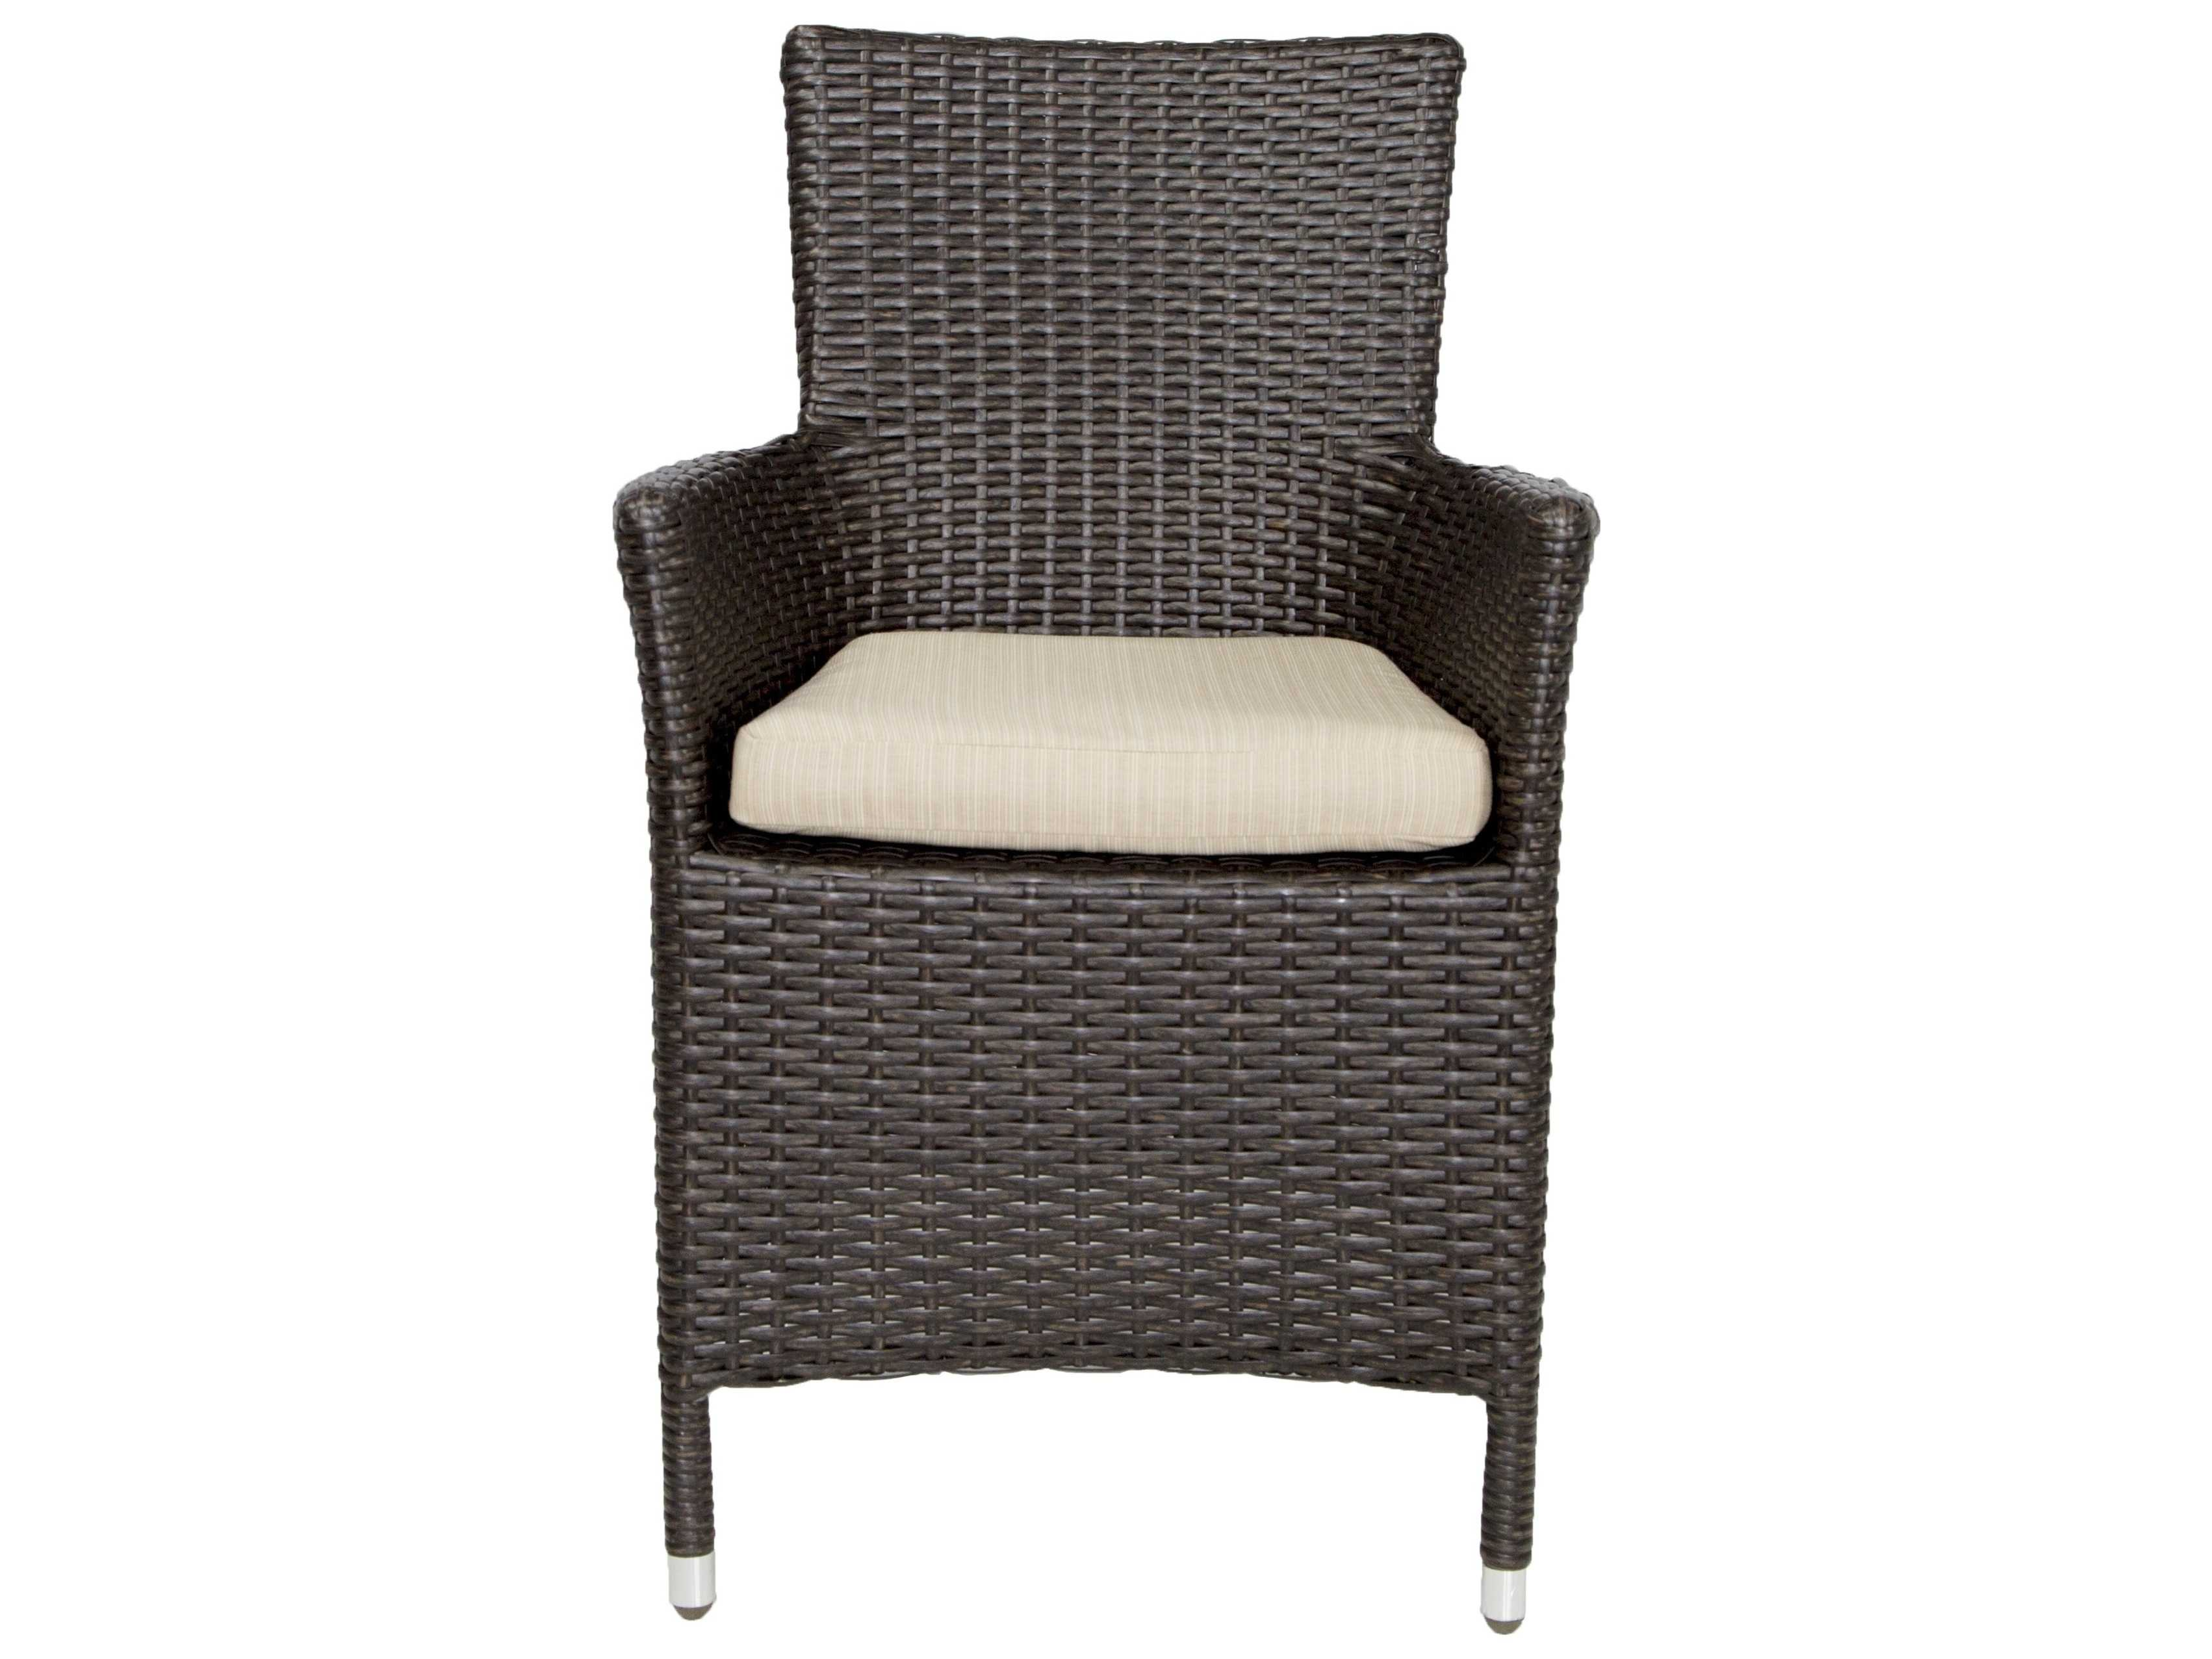 Patio heaven malibu wicker arm chair ph mac for Patio heaven